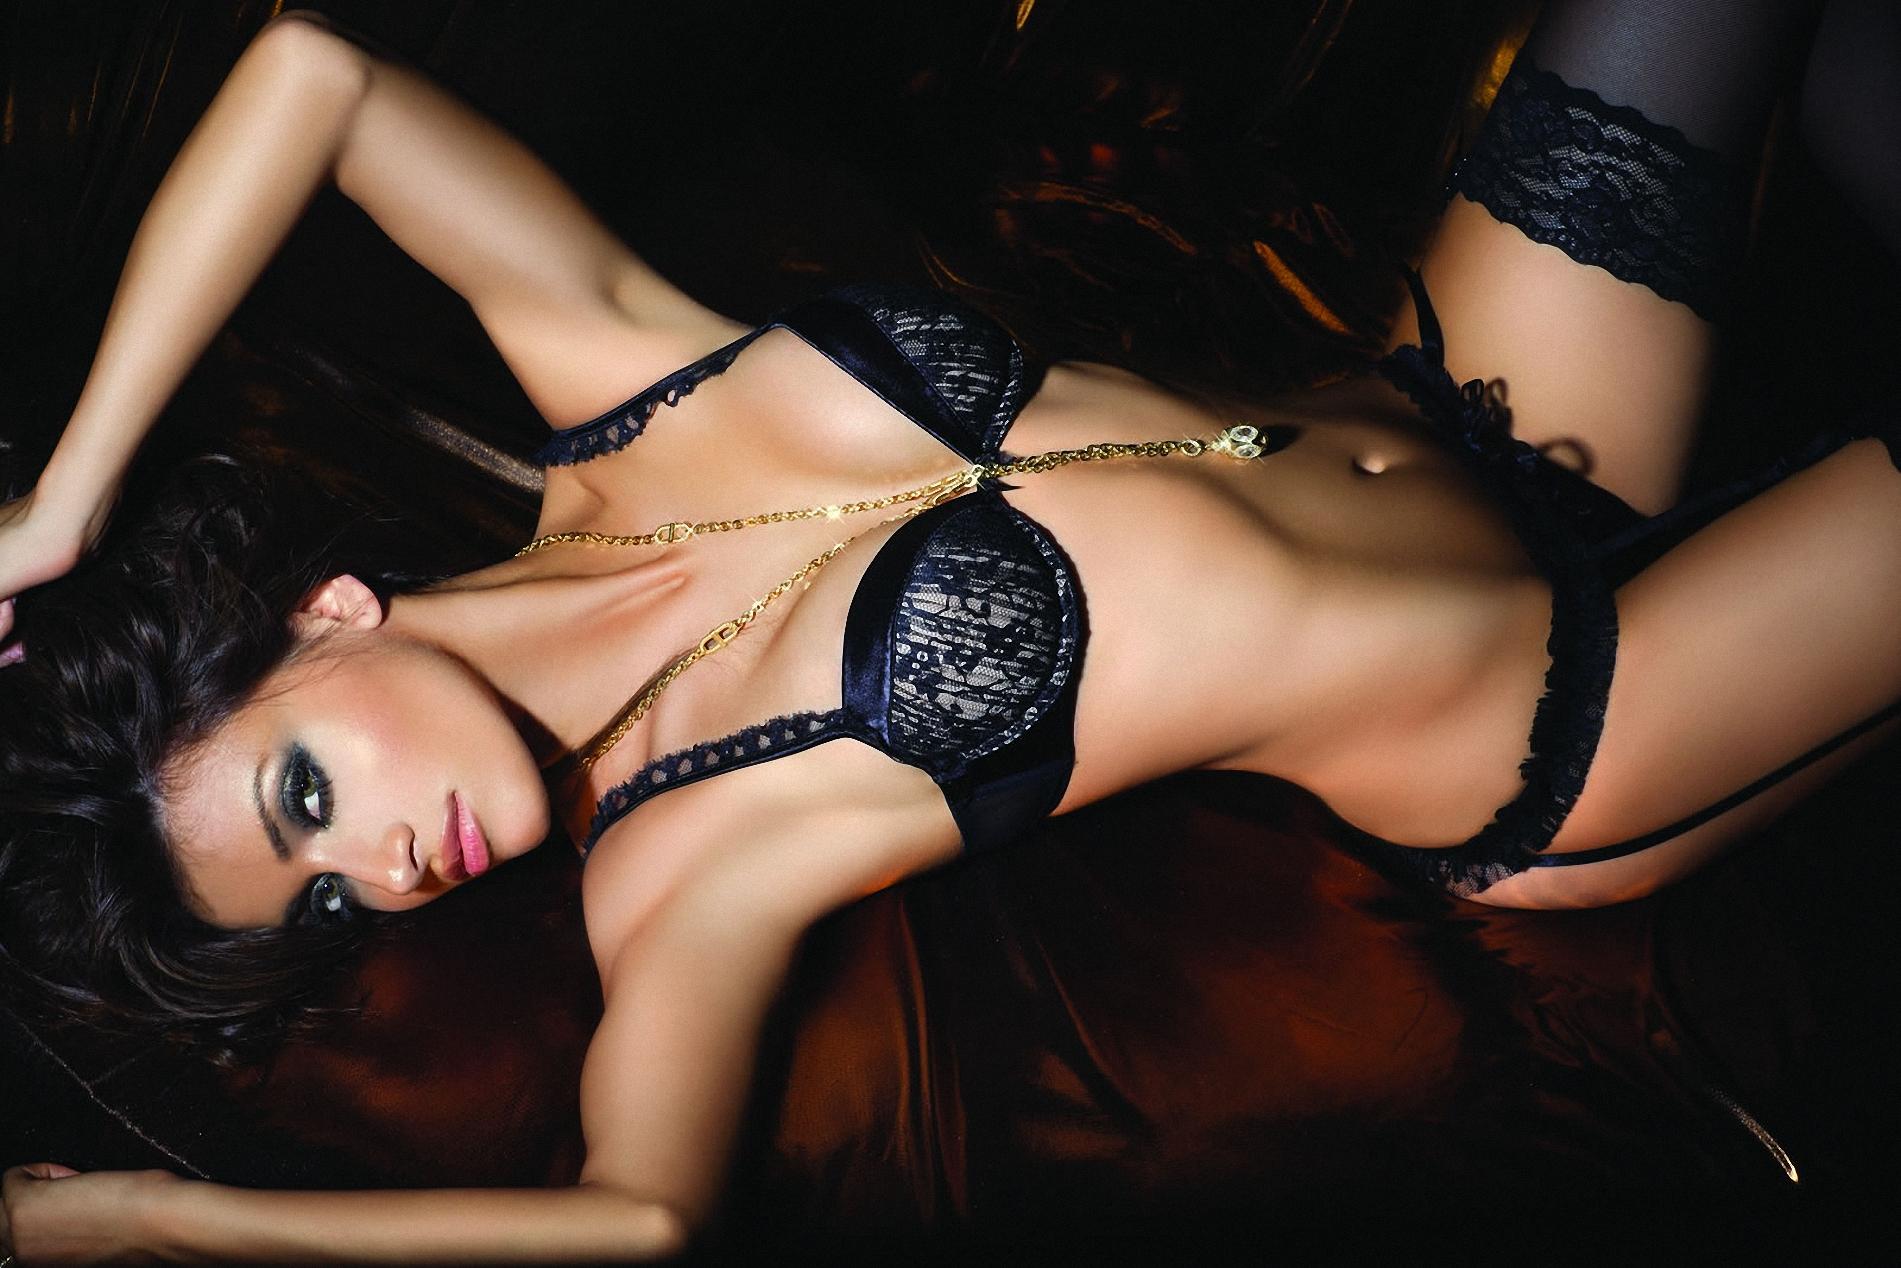 Супер секси герл 8 фотография